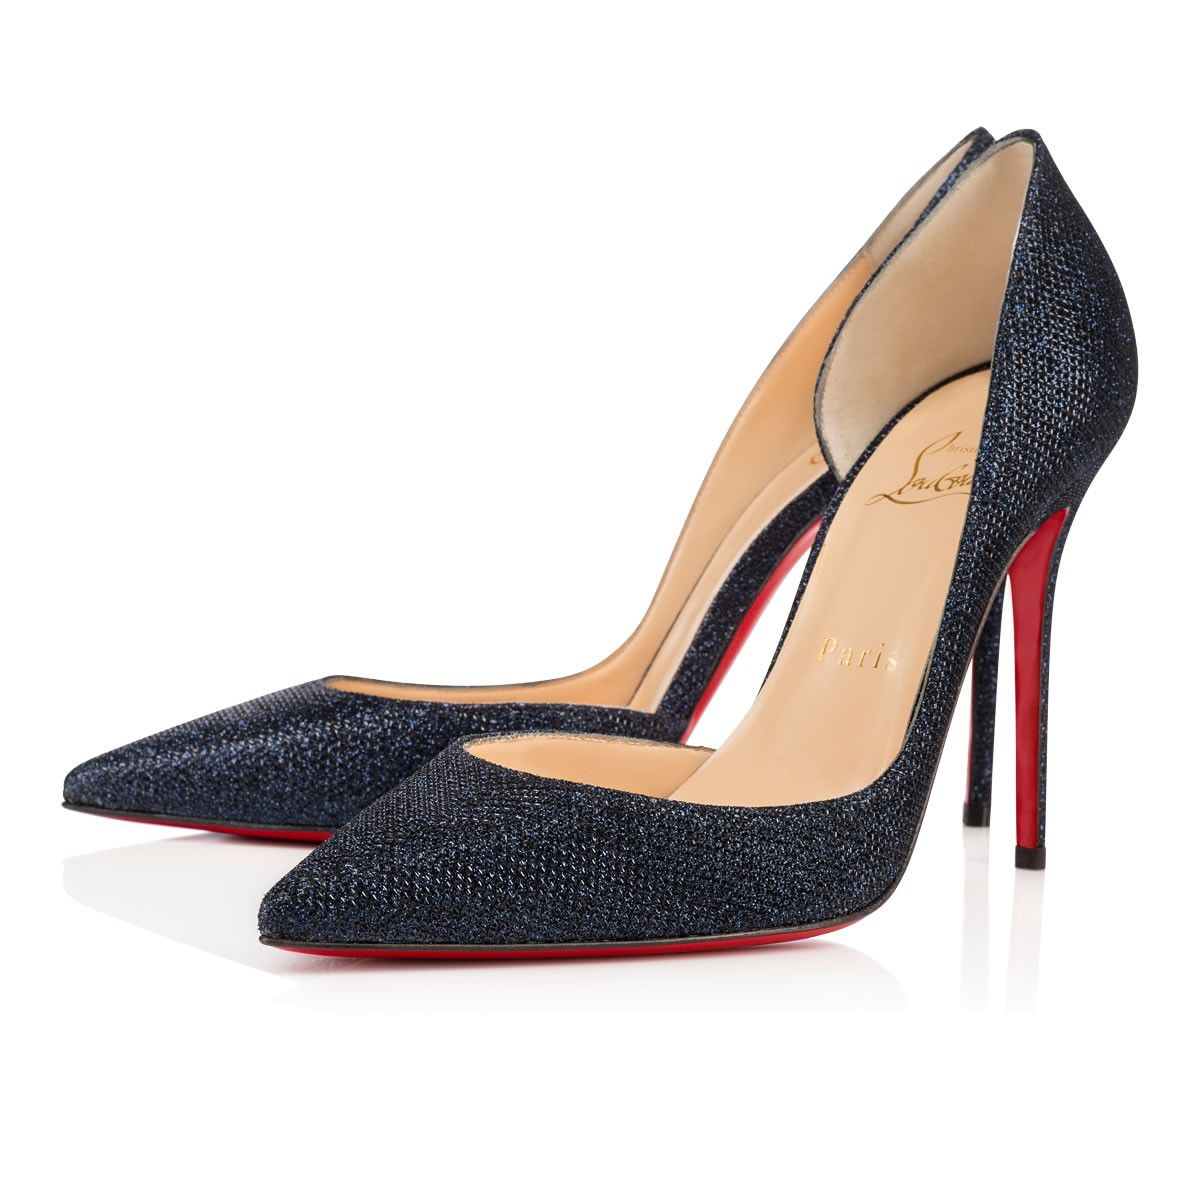 the best attitude 844b5 9fc9e Iriza 100 Black Patent Leather - Women Shoes - Christian ...